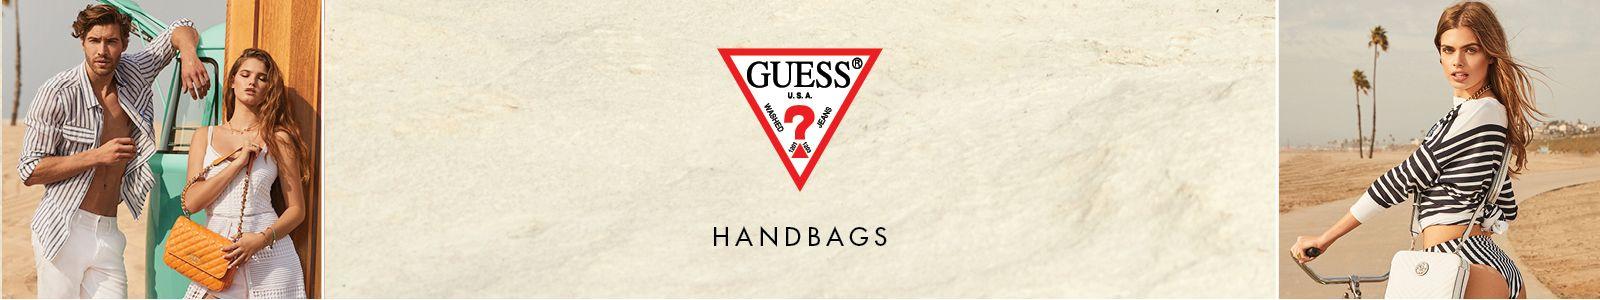 Guess, Handbags